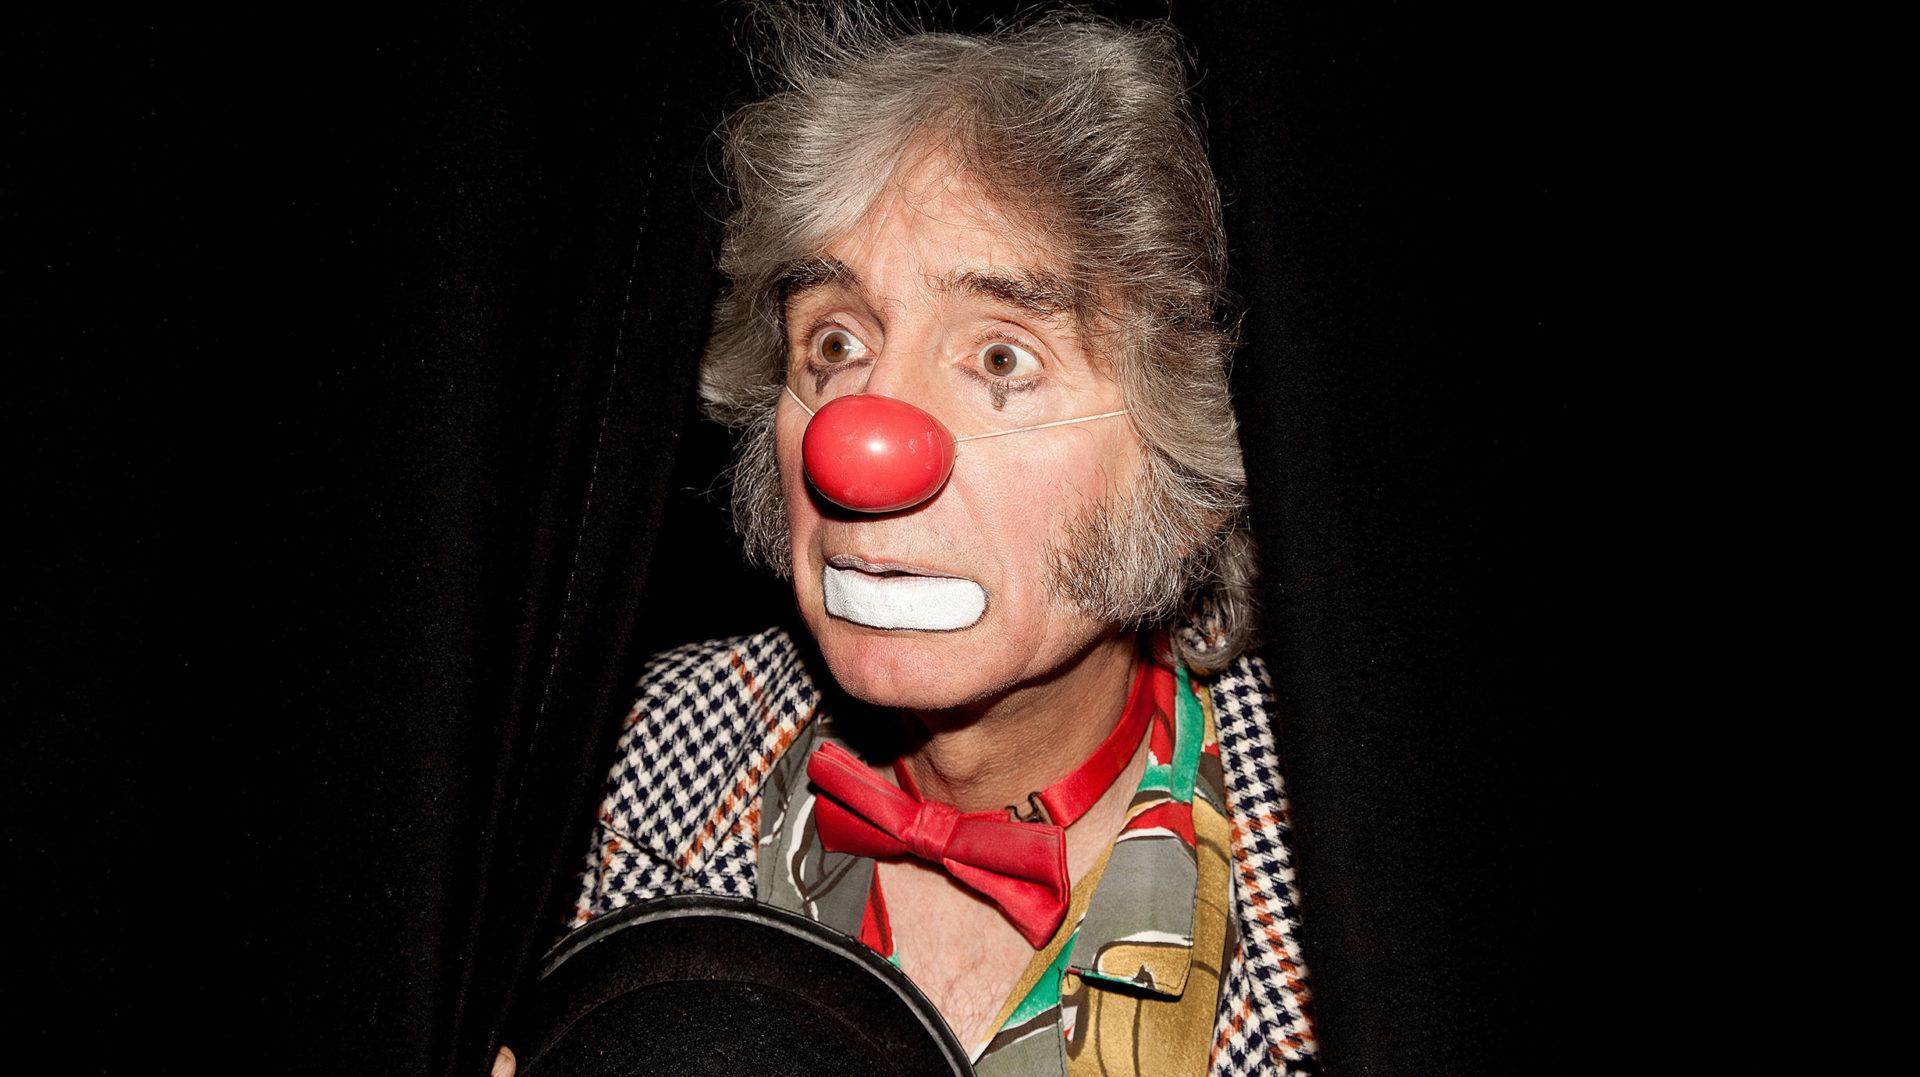 Claret Clown